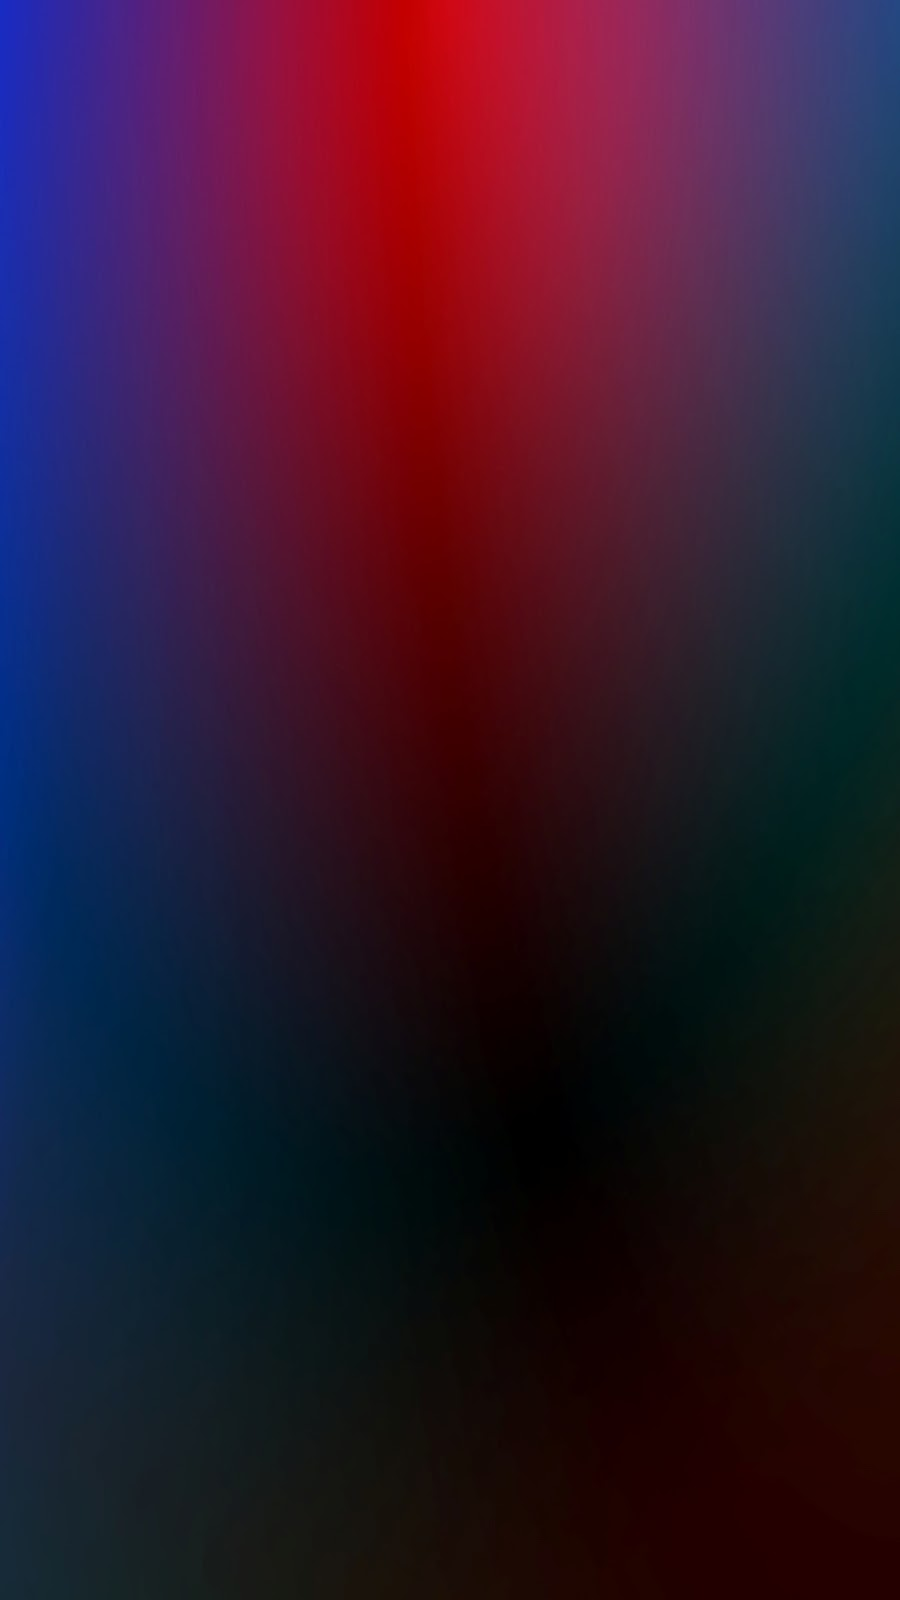 Gradient background wallpaper HD